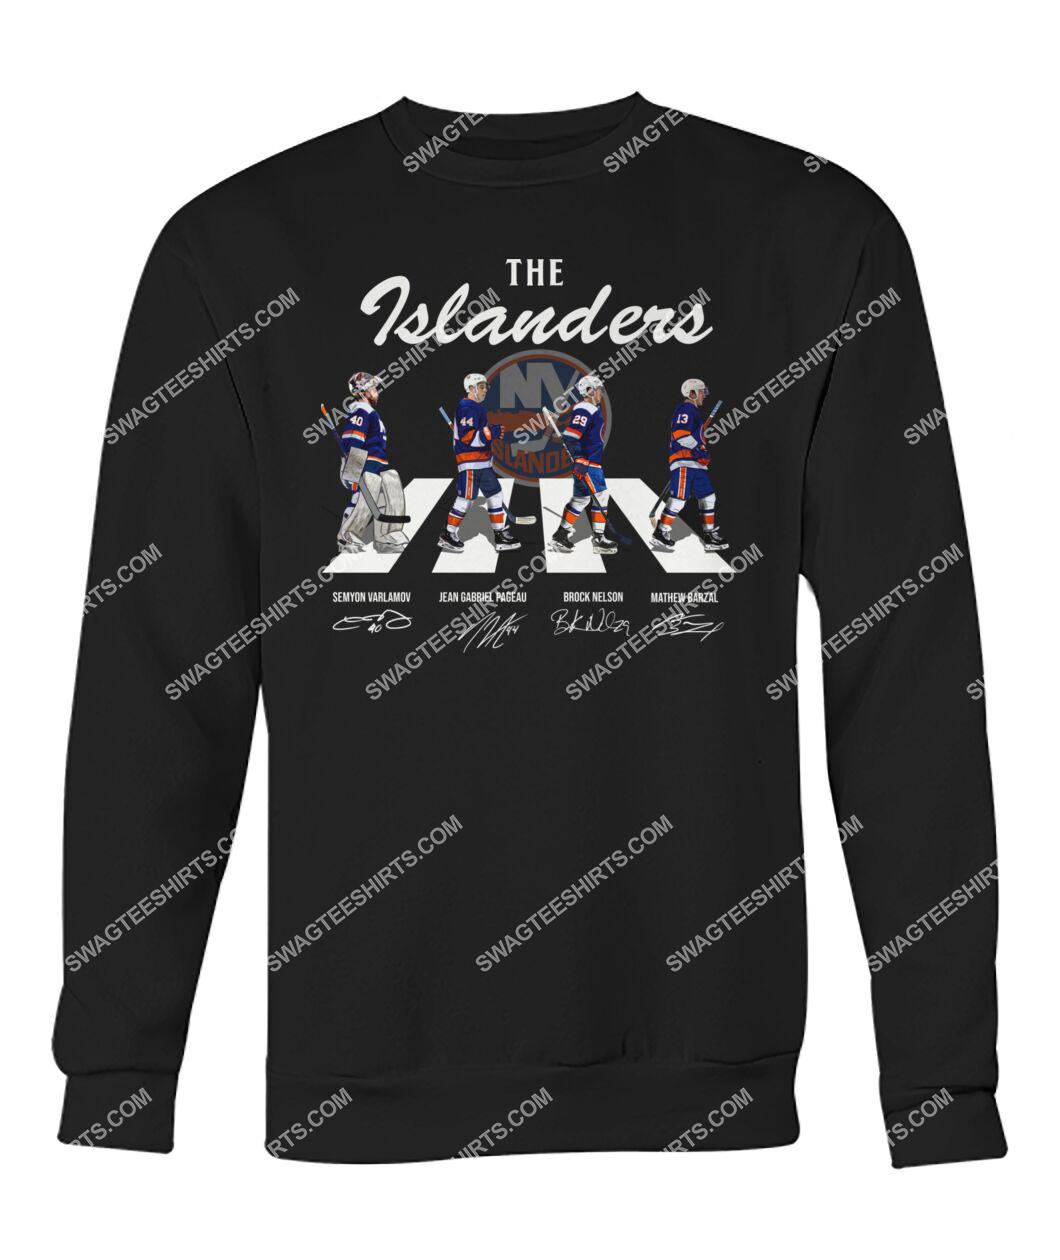 abbey road the new york islanders signatures sweatshirt 1